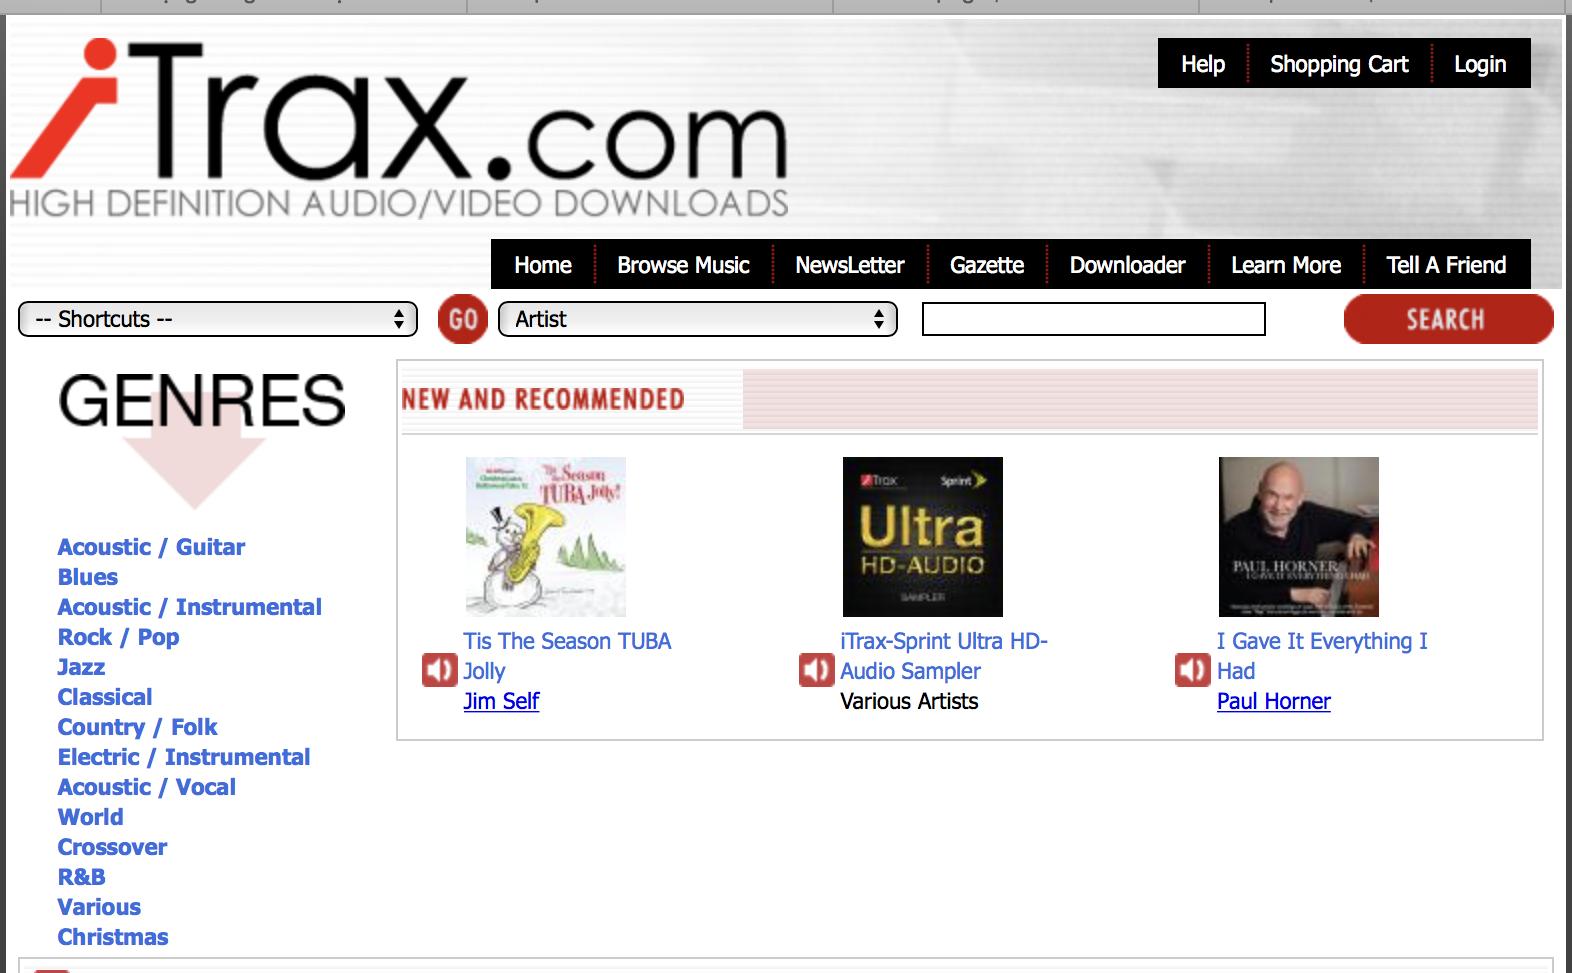 Những website tốt nhất để download nhạc Hi-res - Thế giới số